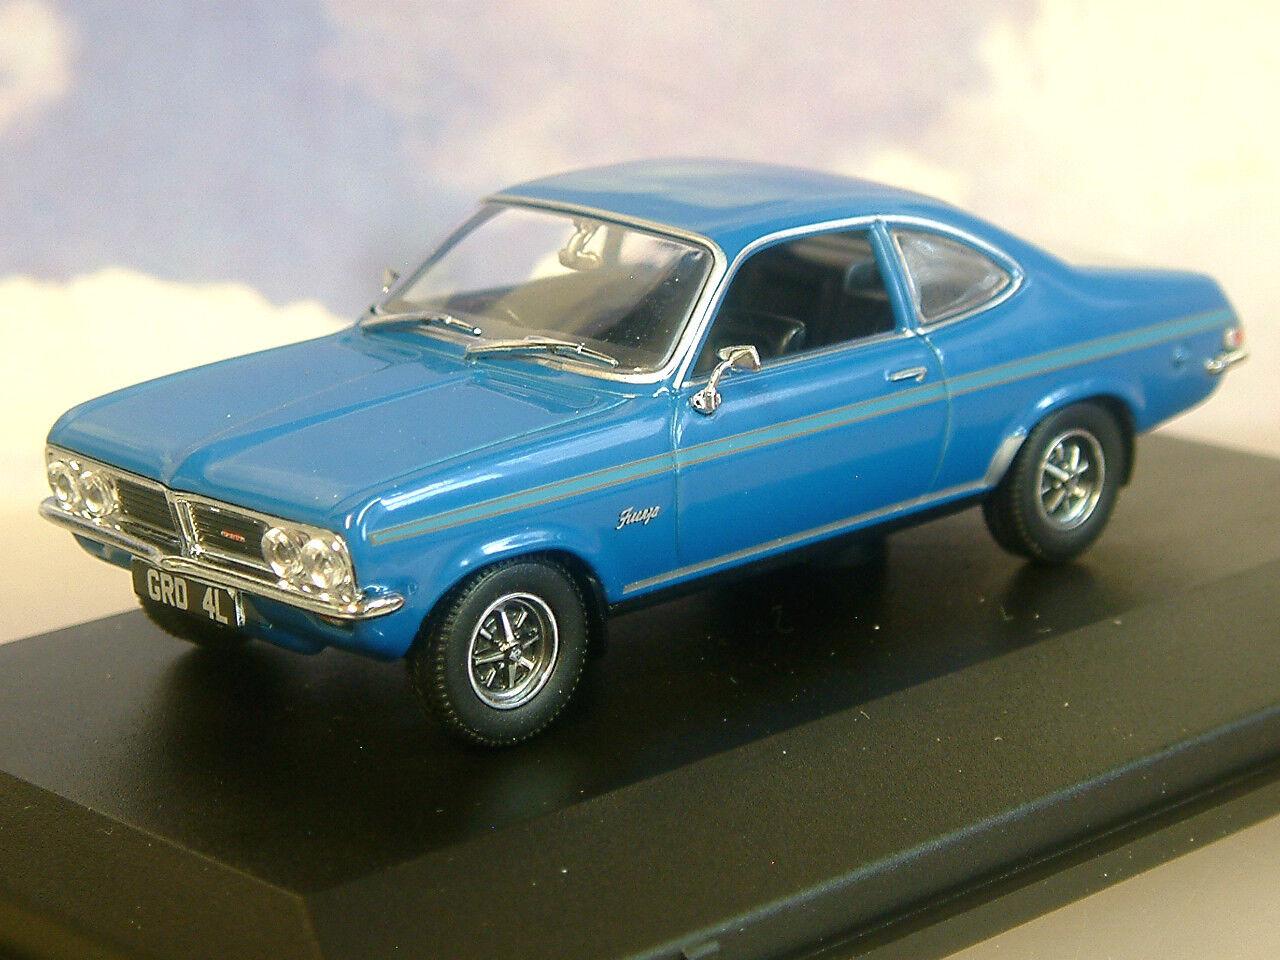 Superbe Oxford Diecast 1 43 1971-75 Opel Firenza Sport Sl Oiseau blue blue Vf001